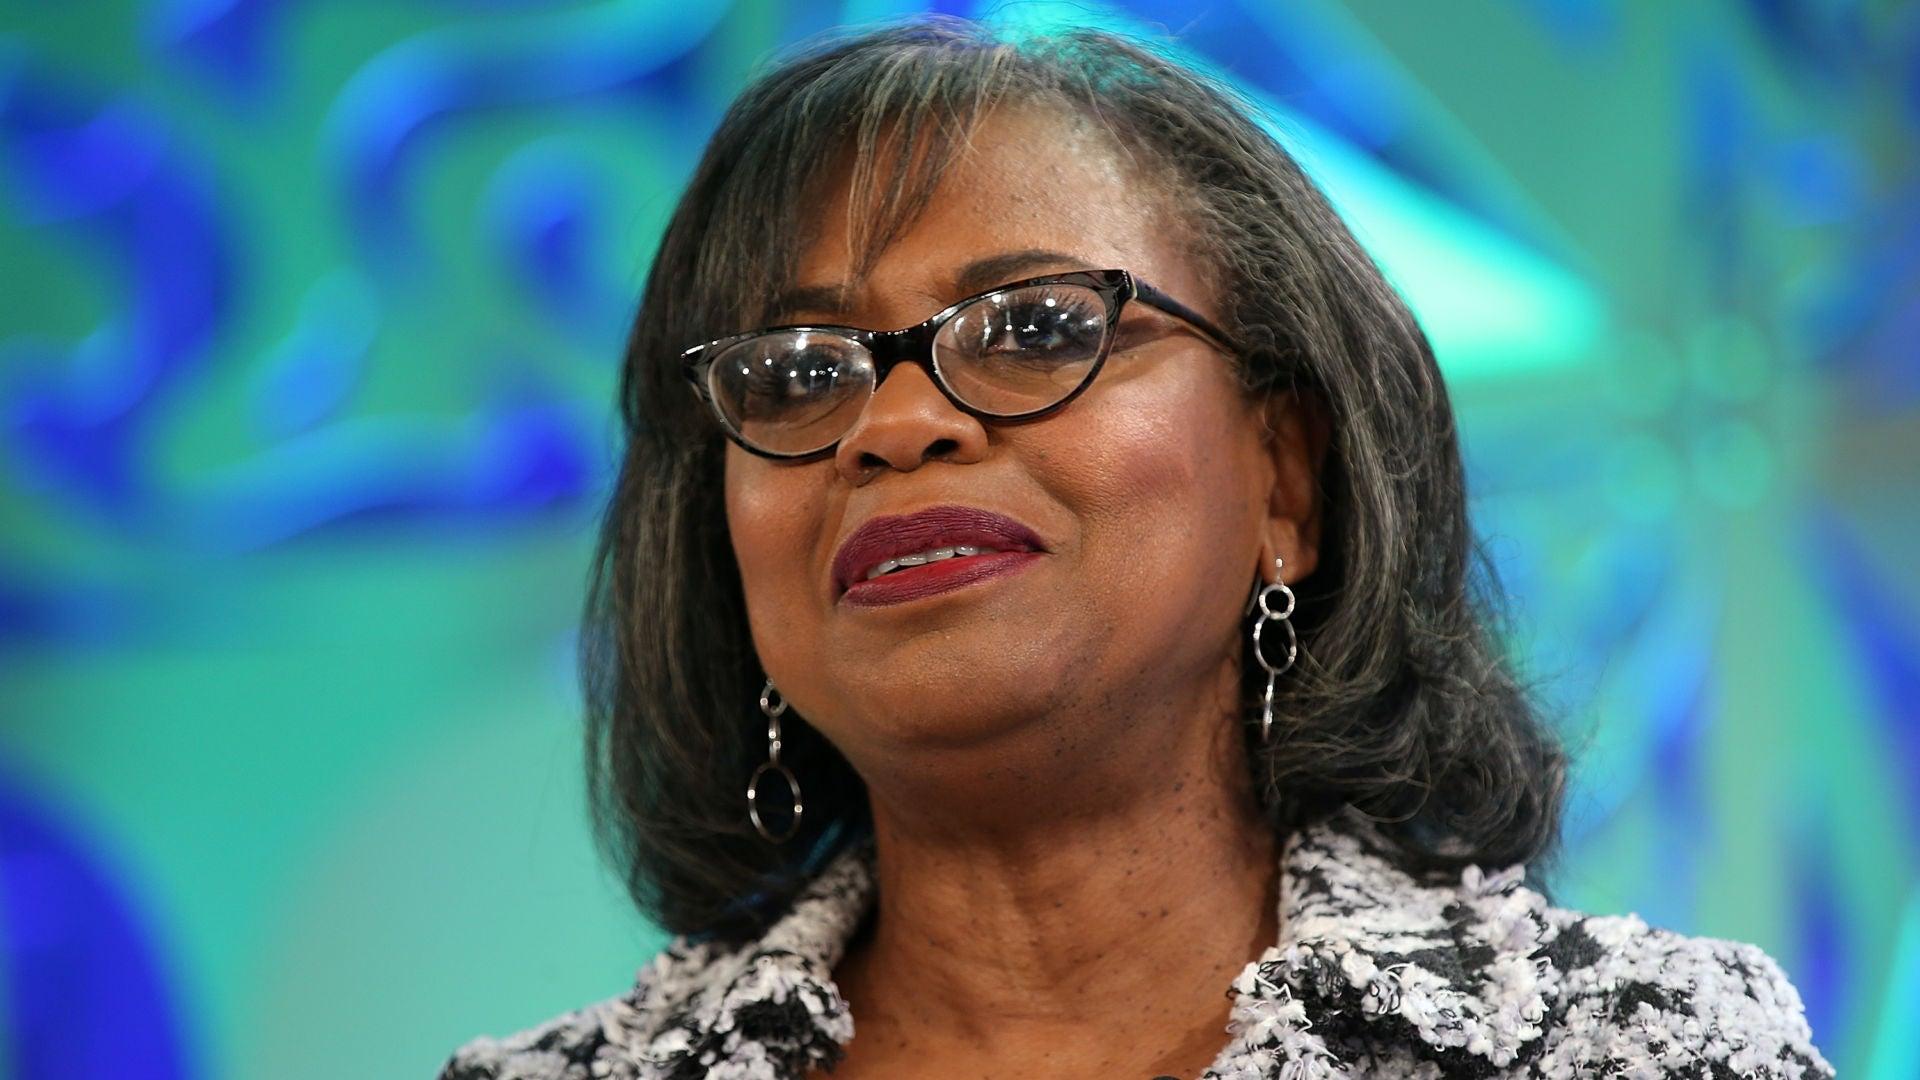 Anita Hill Says She Is 'Ready To Hold Joe Biden Accountable'